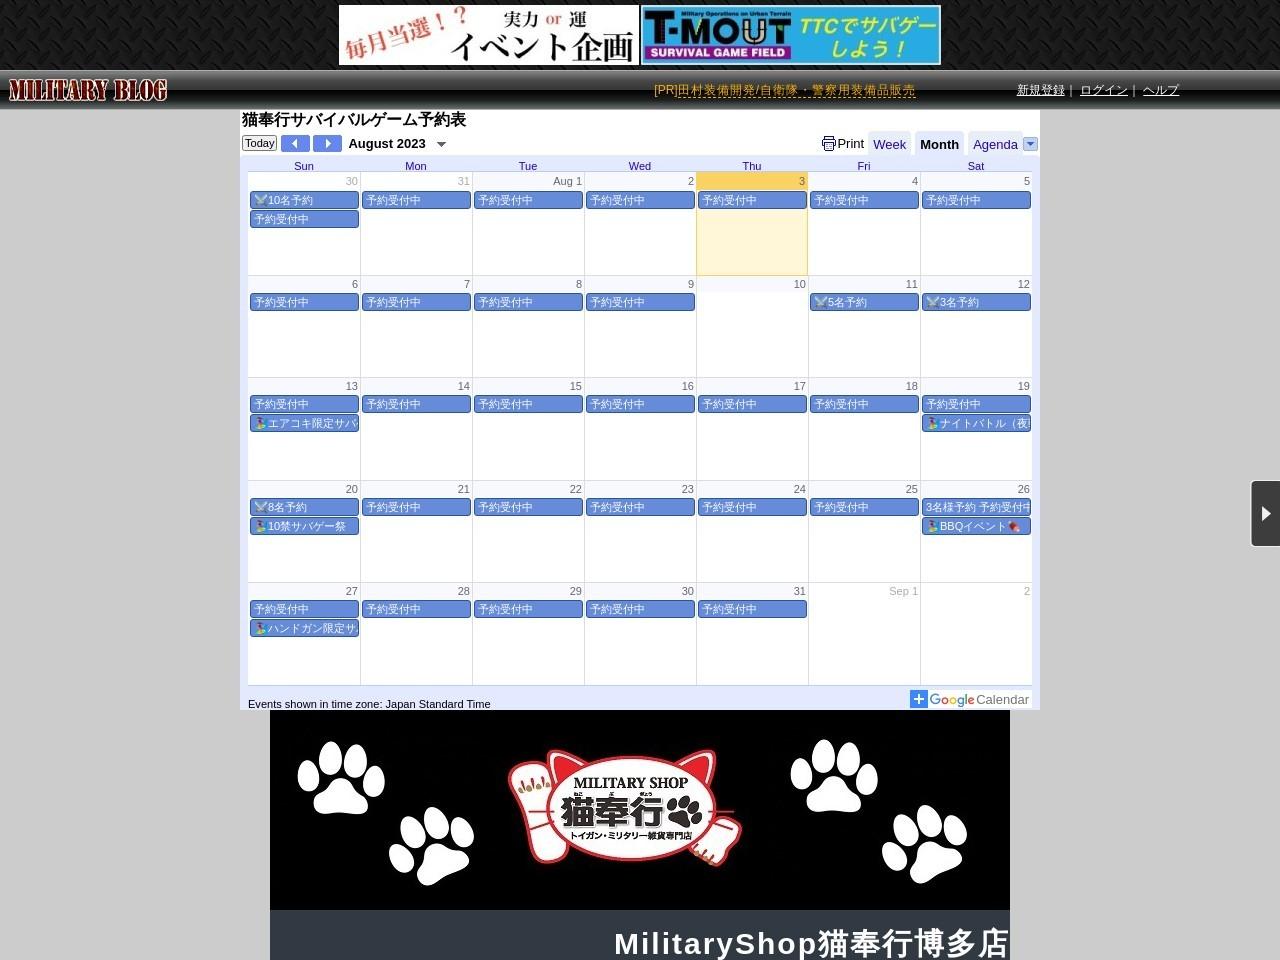 Military Shop猫奉行